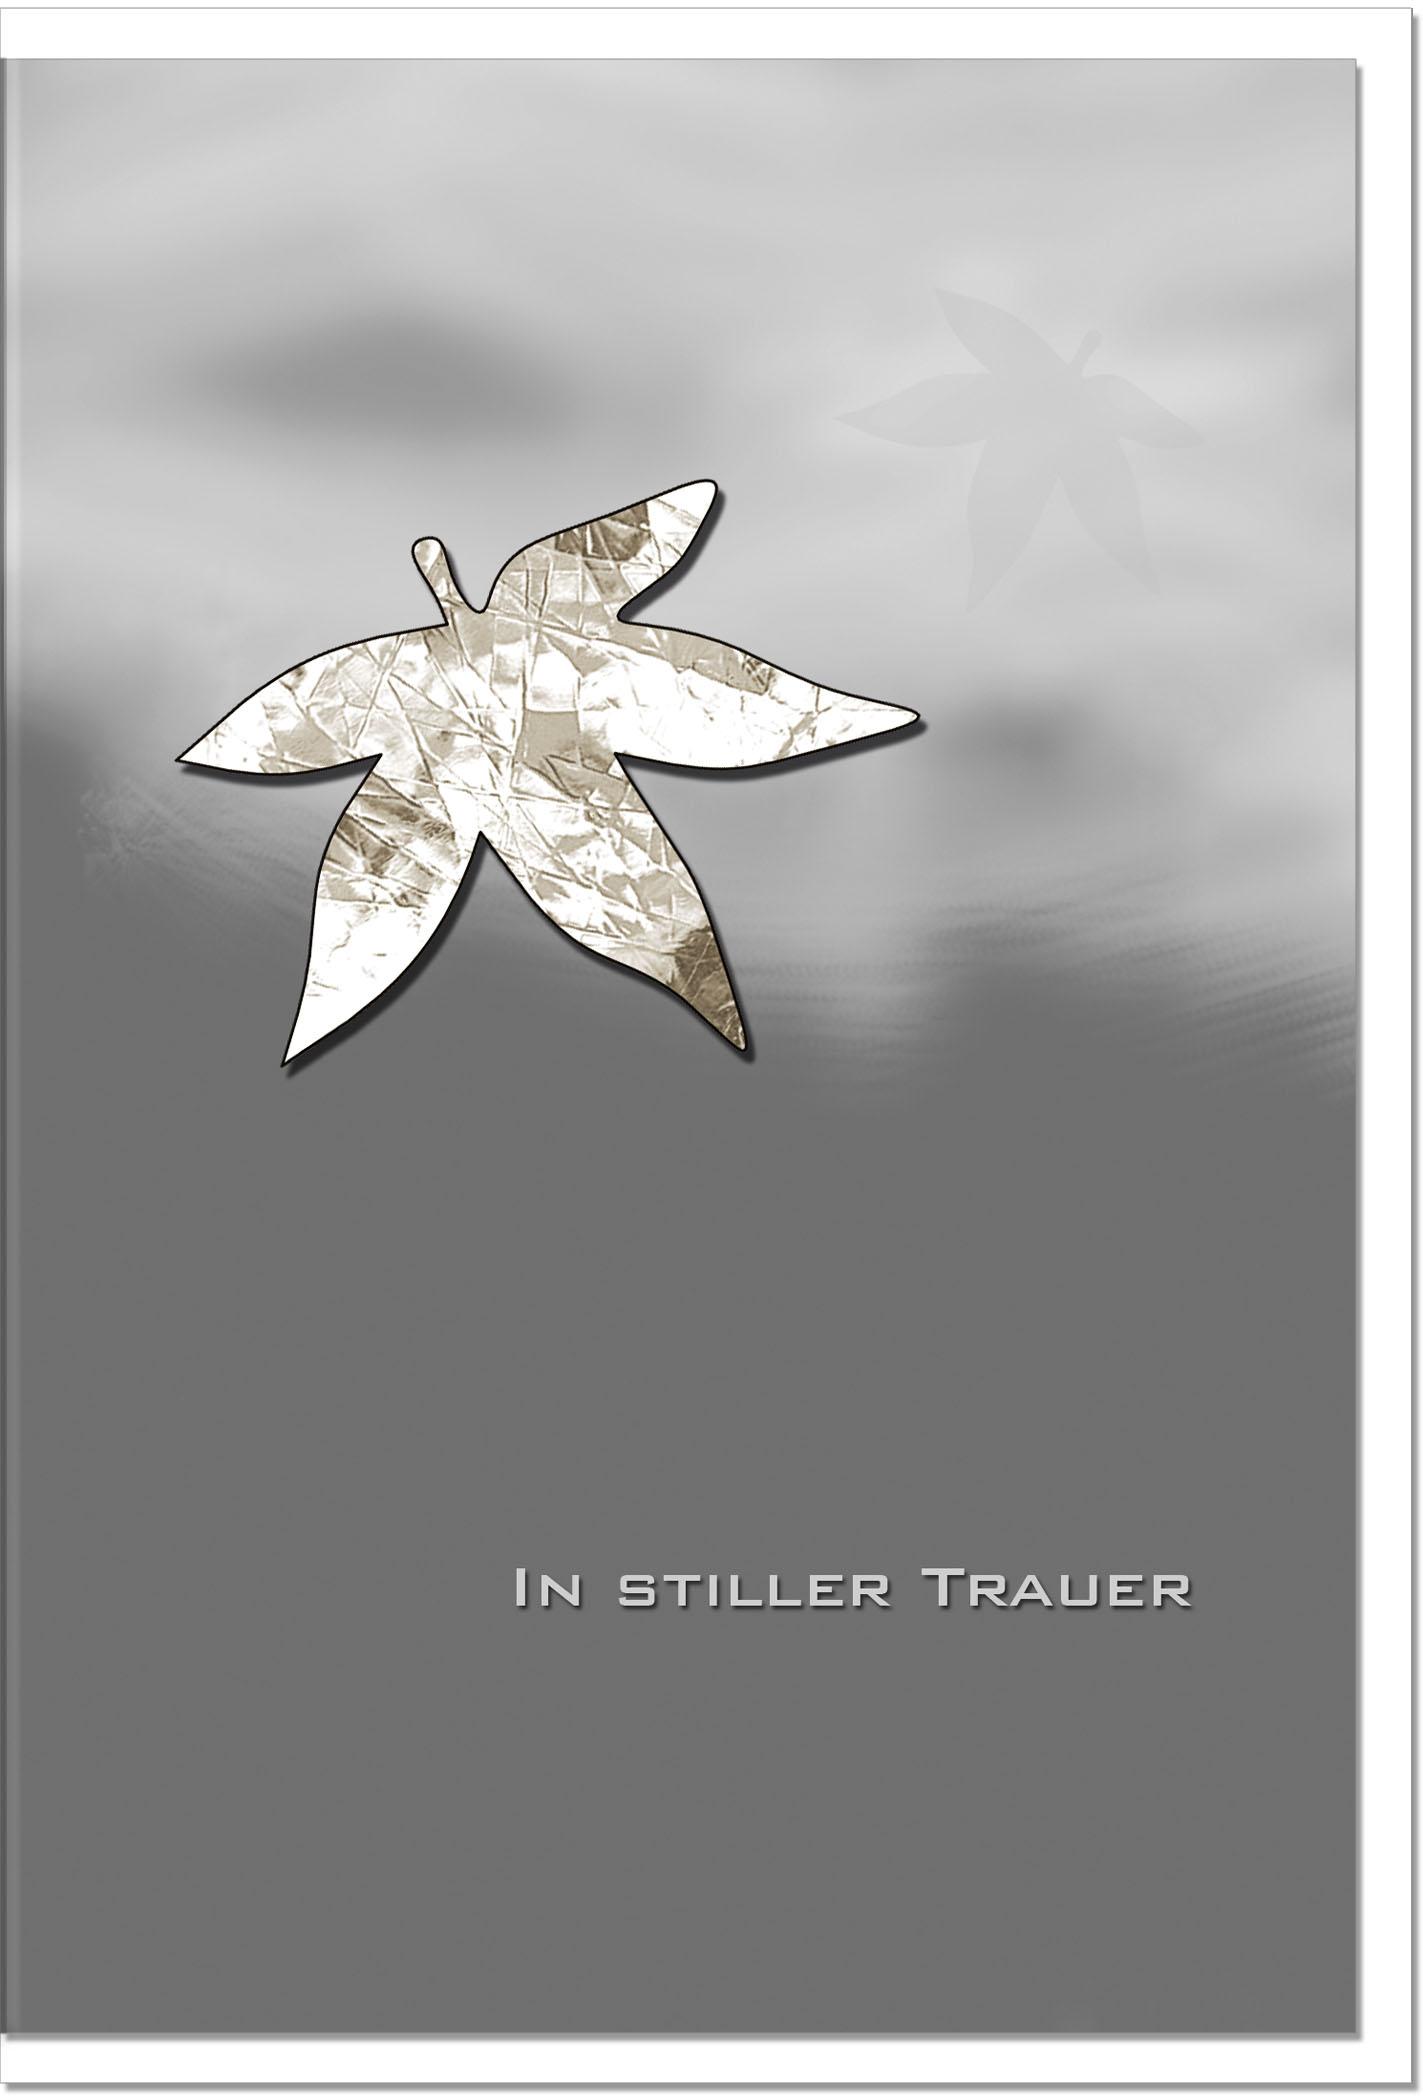 Trauerkarte Beileidskarte / Herbstblatt